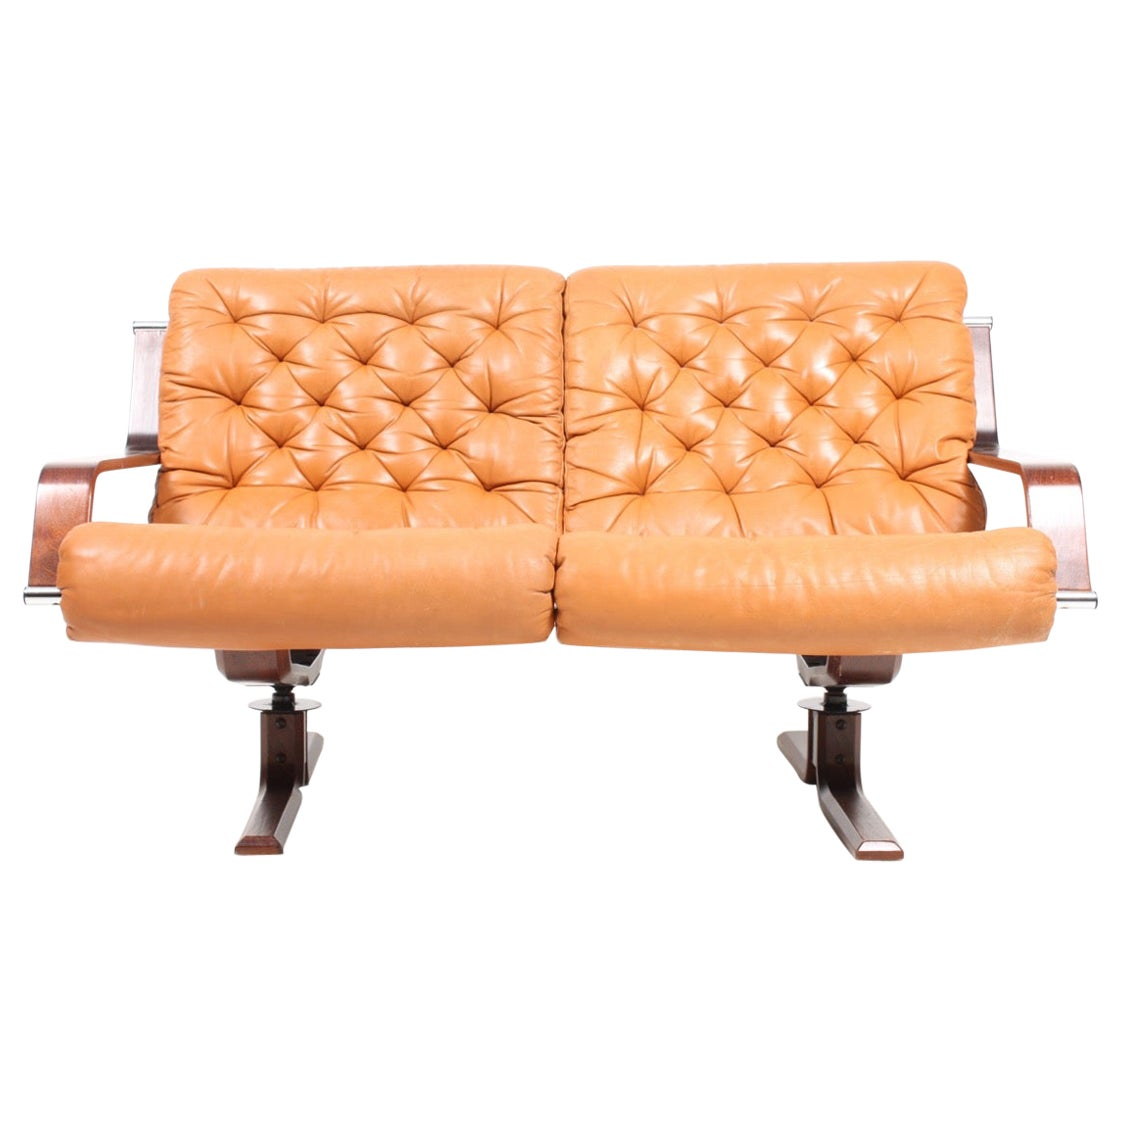 Scandinavian Modern Sofa in Patinated Leather, Midcentury Design, 1960s